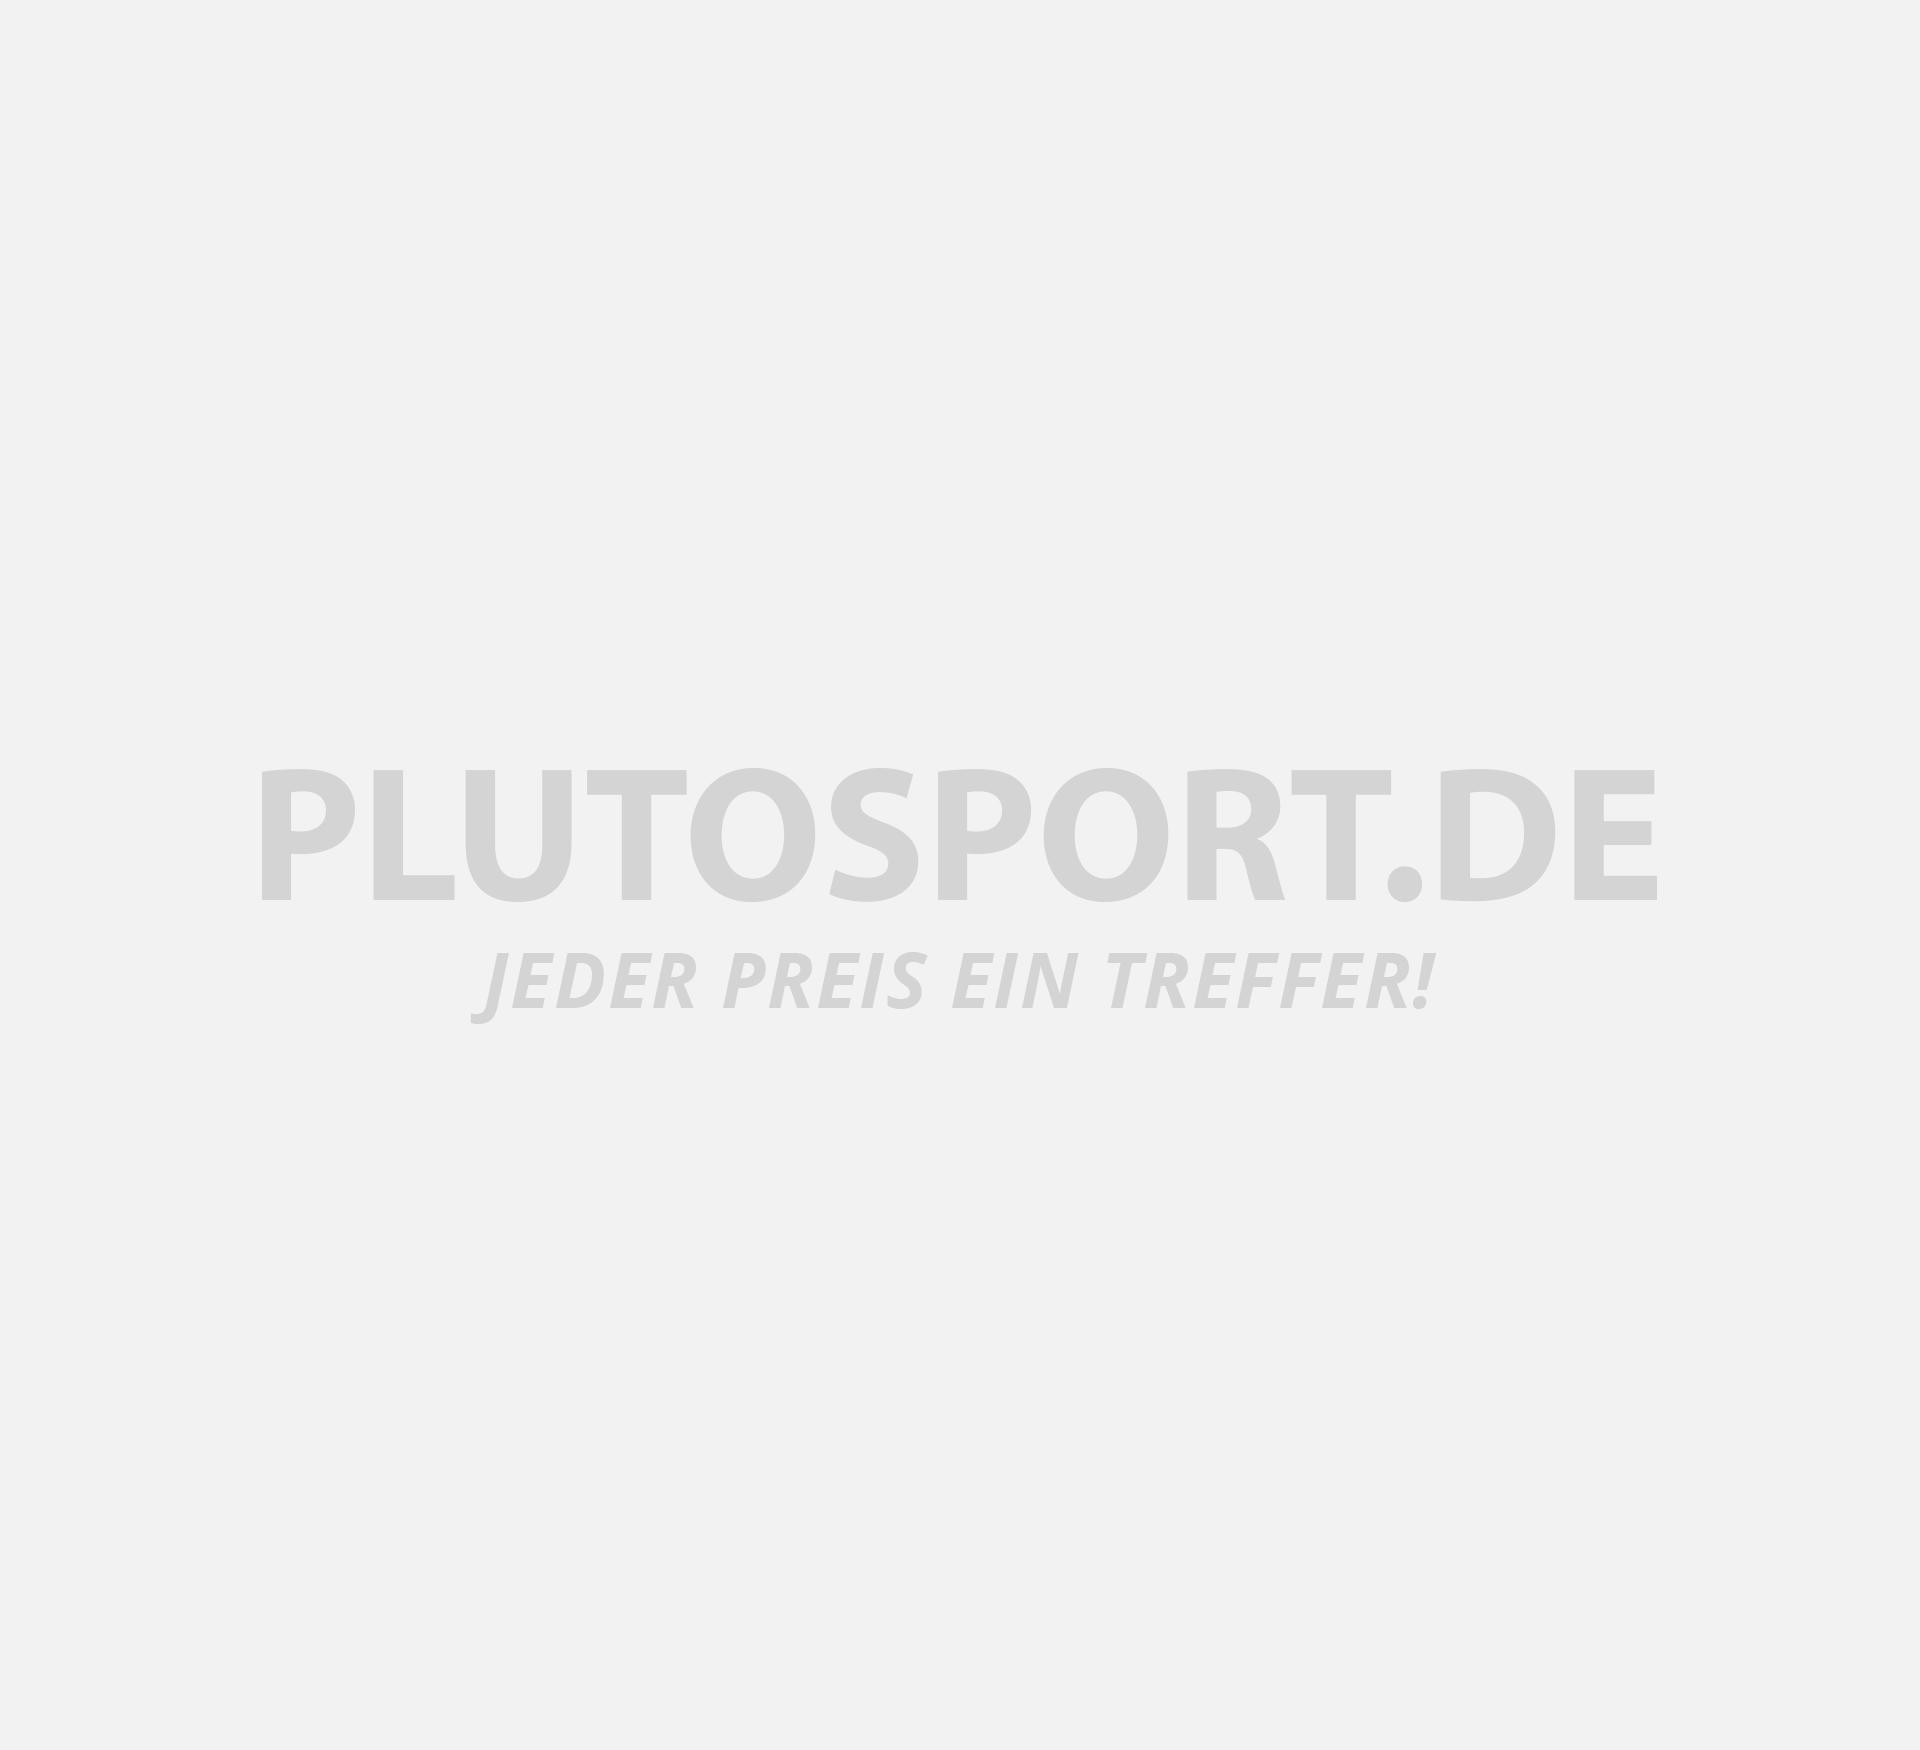 Nijdam ABEC 9 Chrom Kugellager (16-pack)